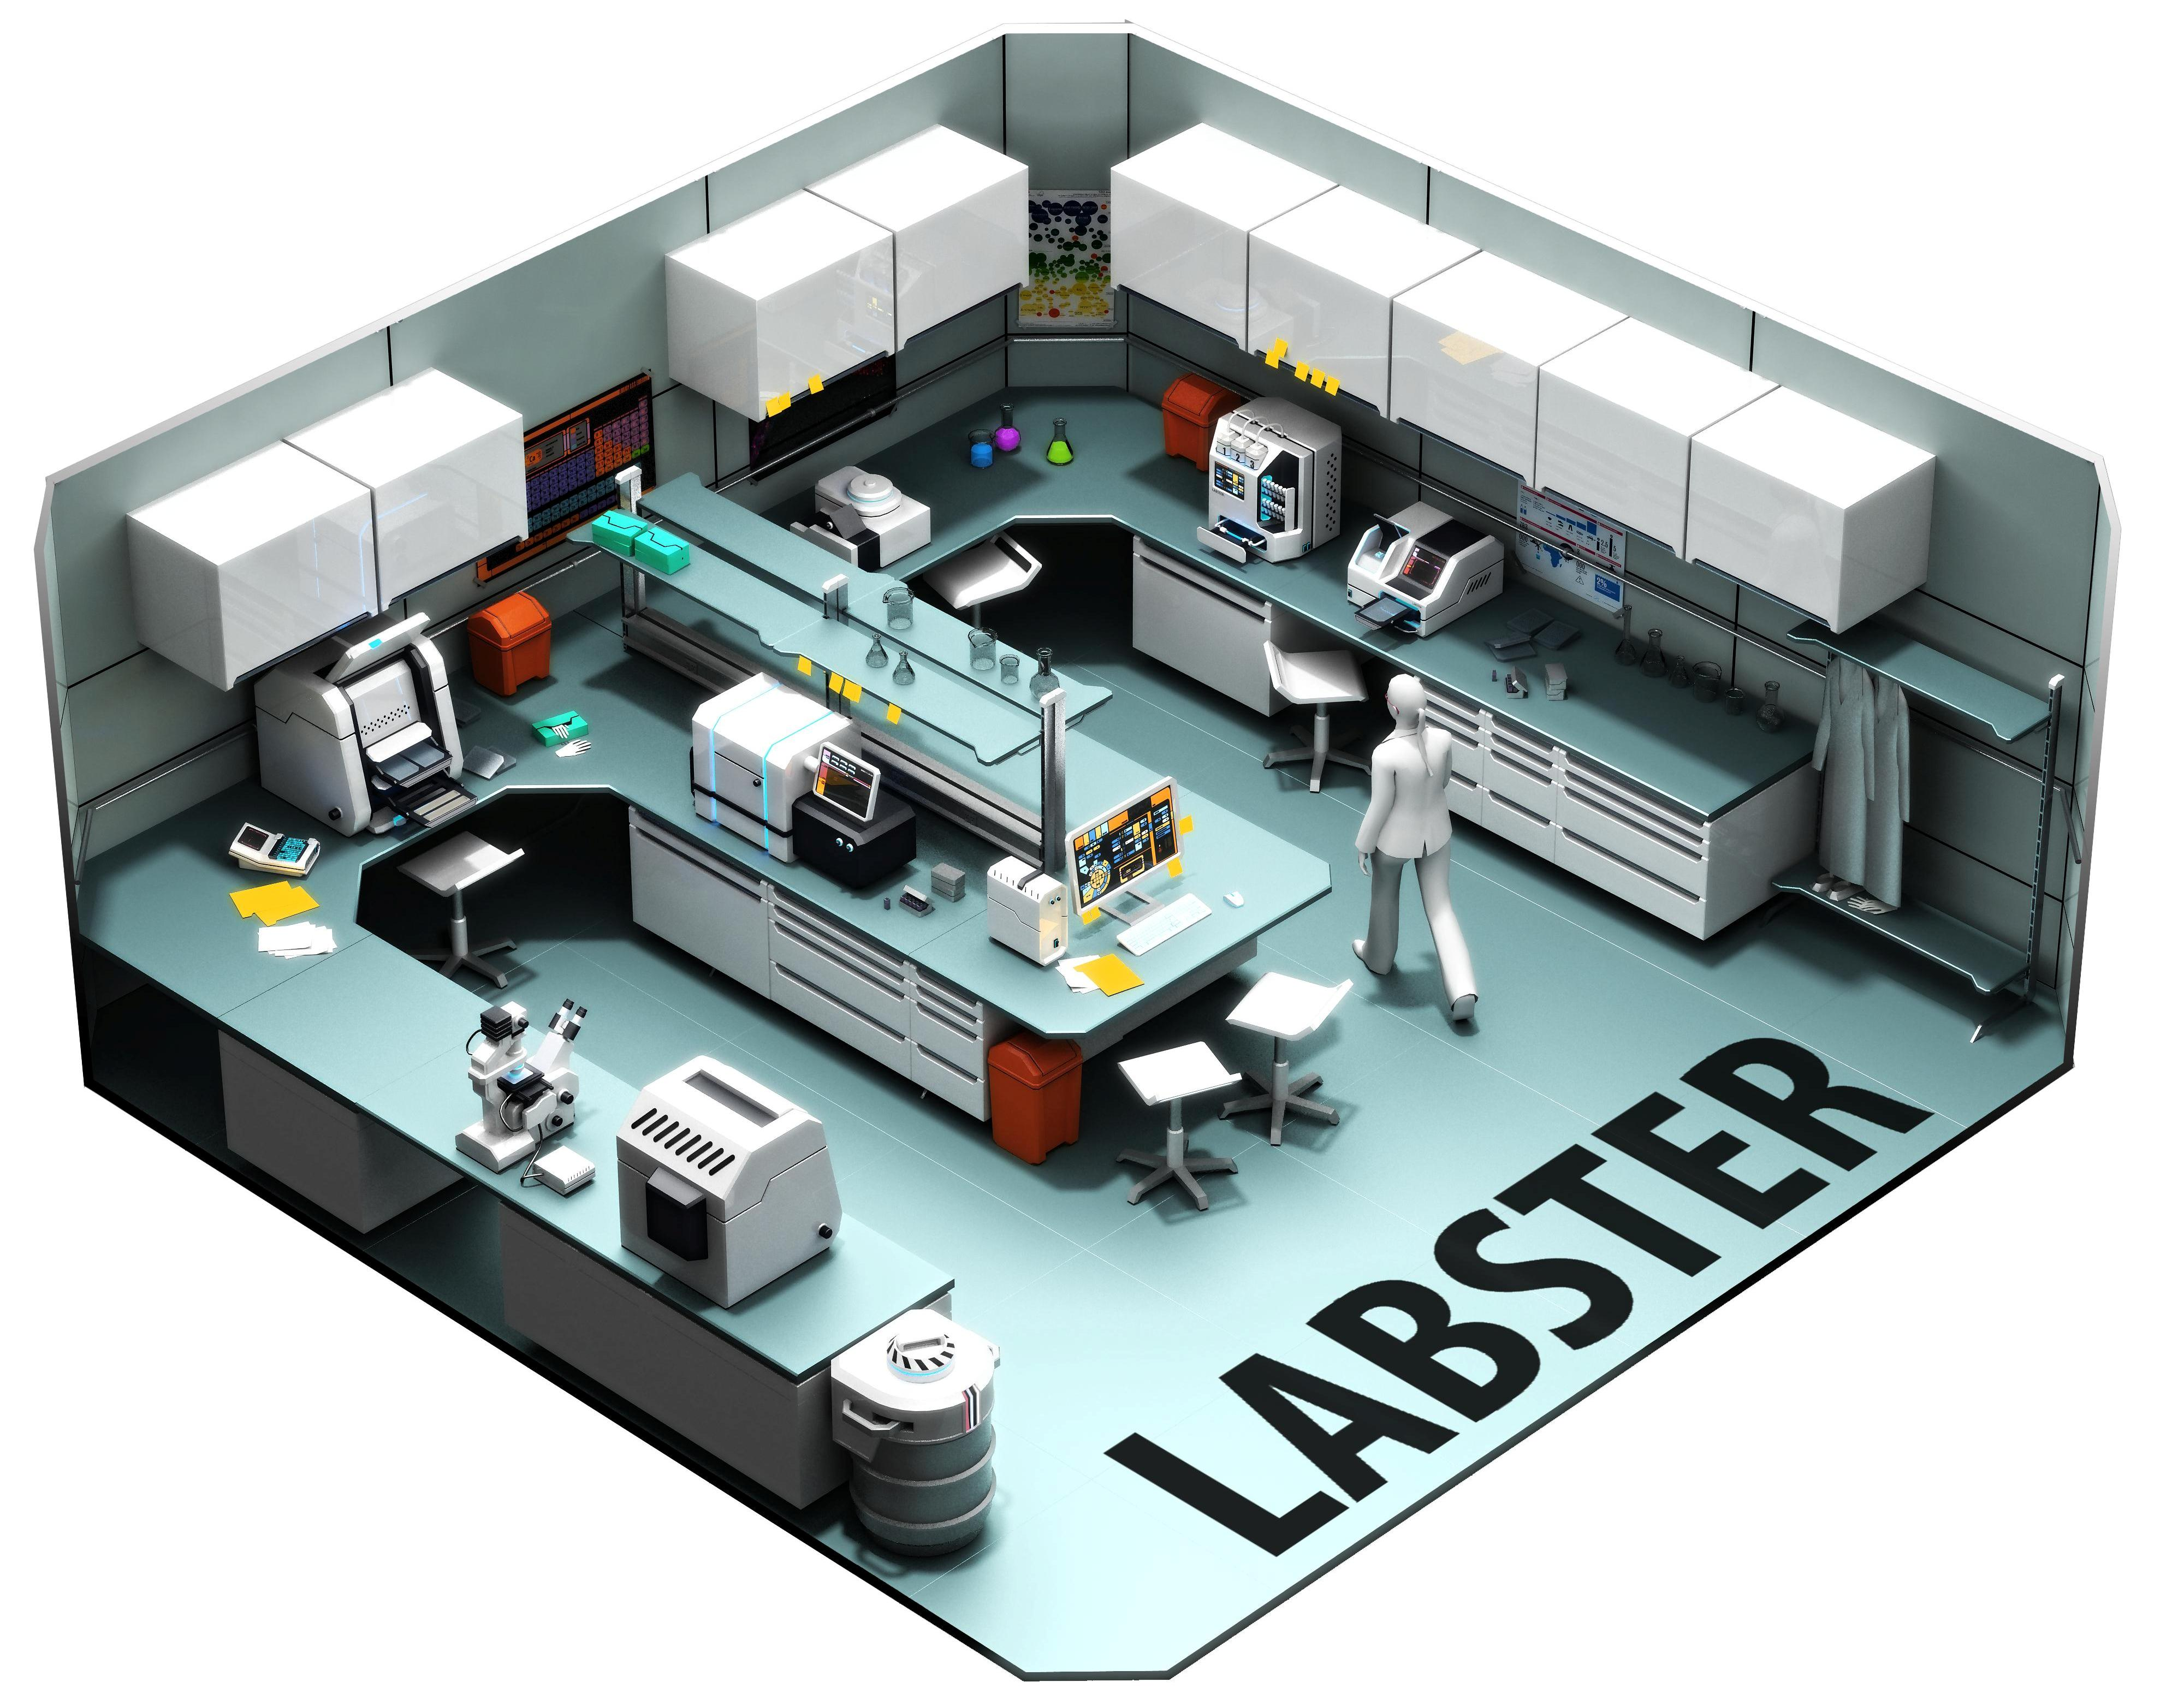 Labster raises $10 million to bring virtual lab simulations